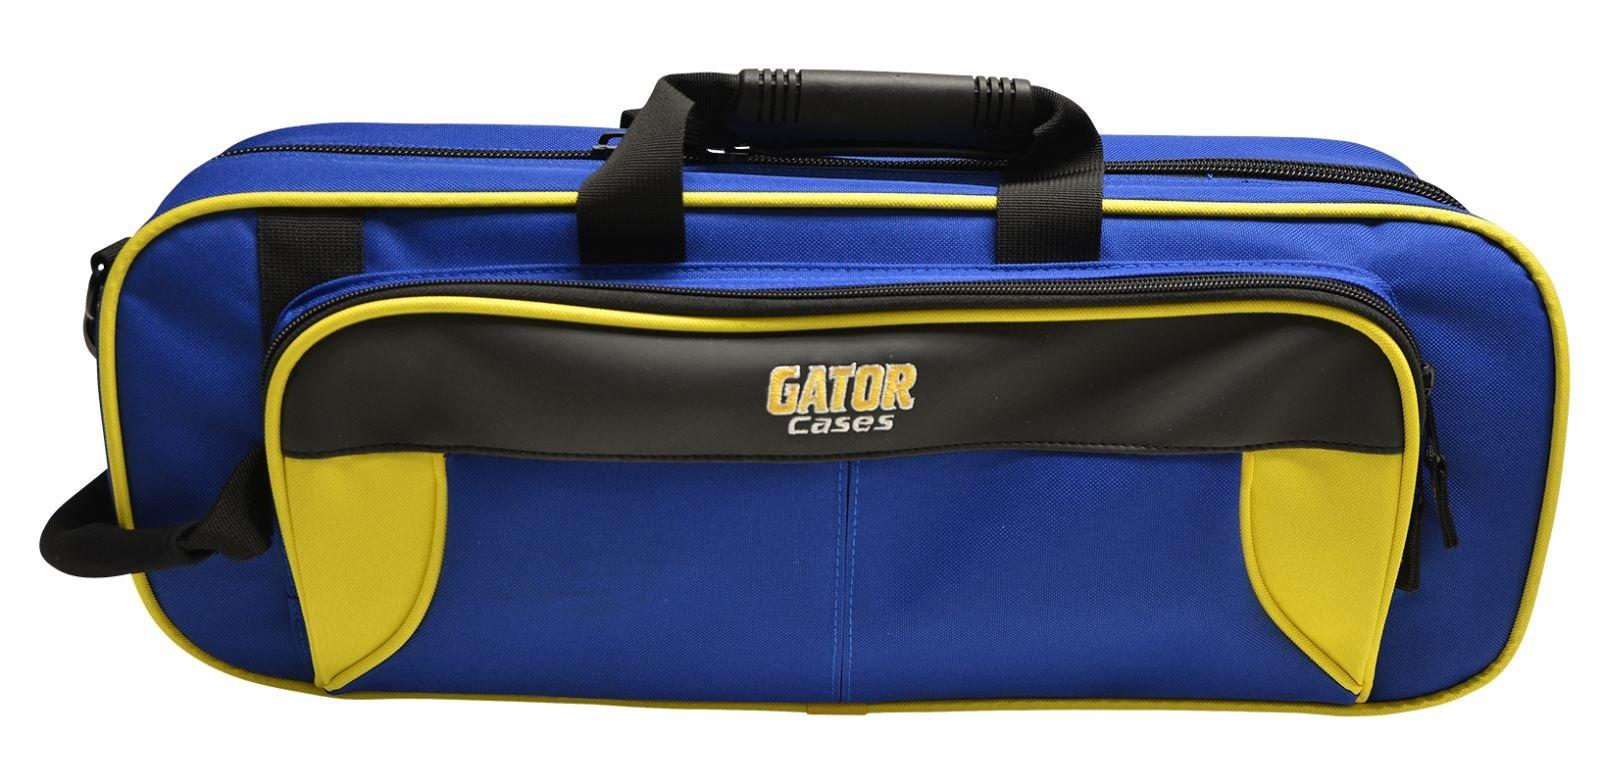 Gator GL-TRUMPET-YB Lightweight Spirit Series Trumpet Case, Yellow and Blue by Gator (Image #1)